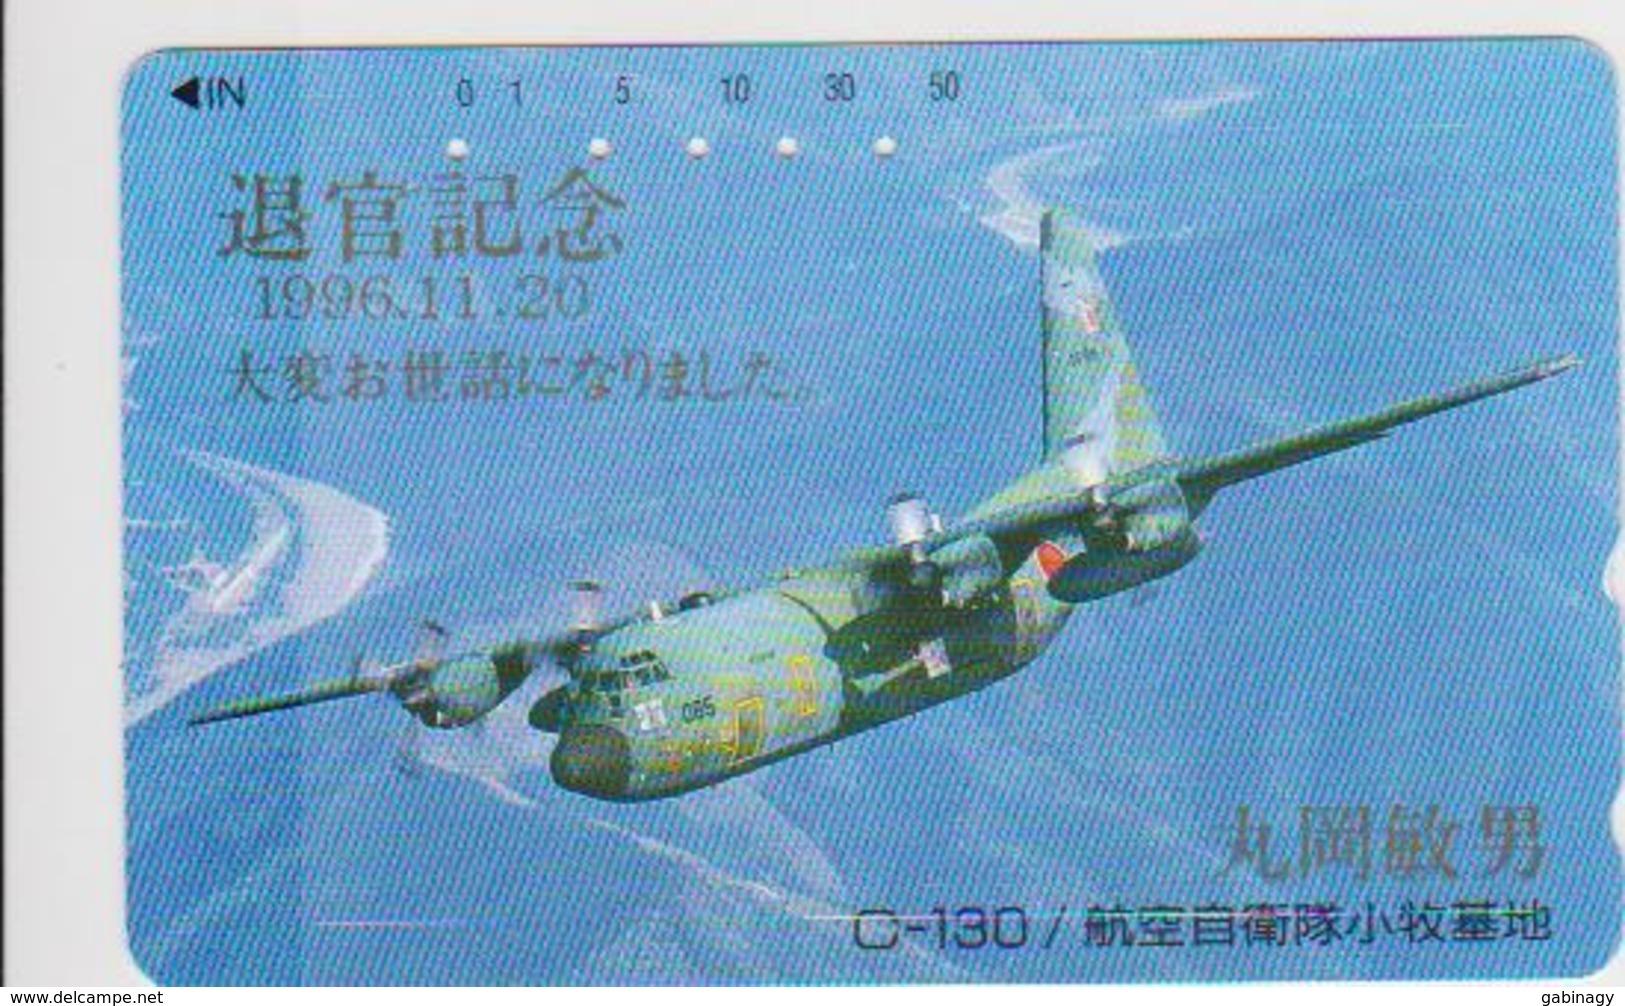 AIRPLANE - JAPAN-246 - MILITARY - Avions